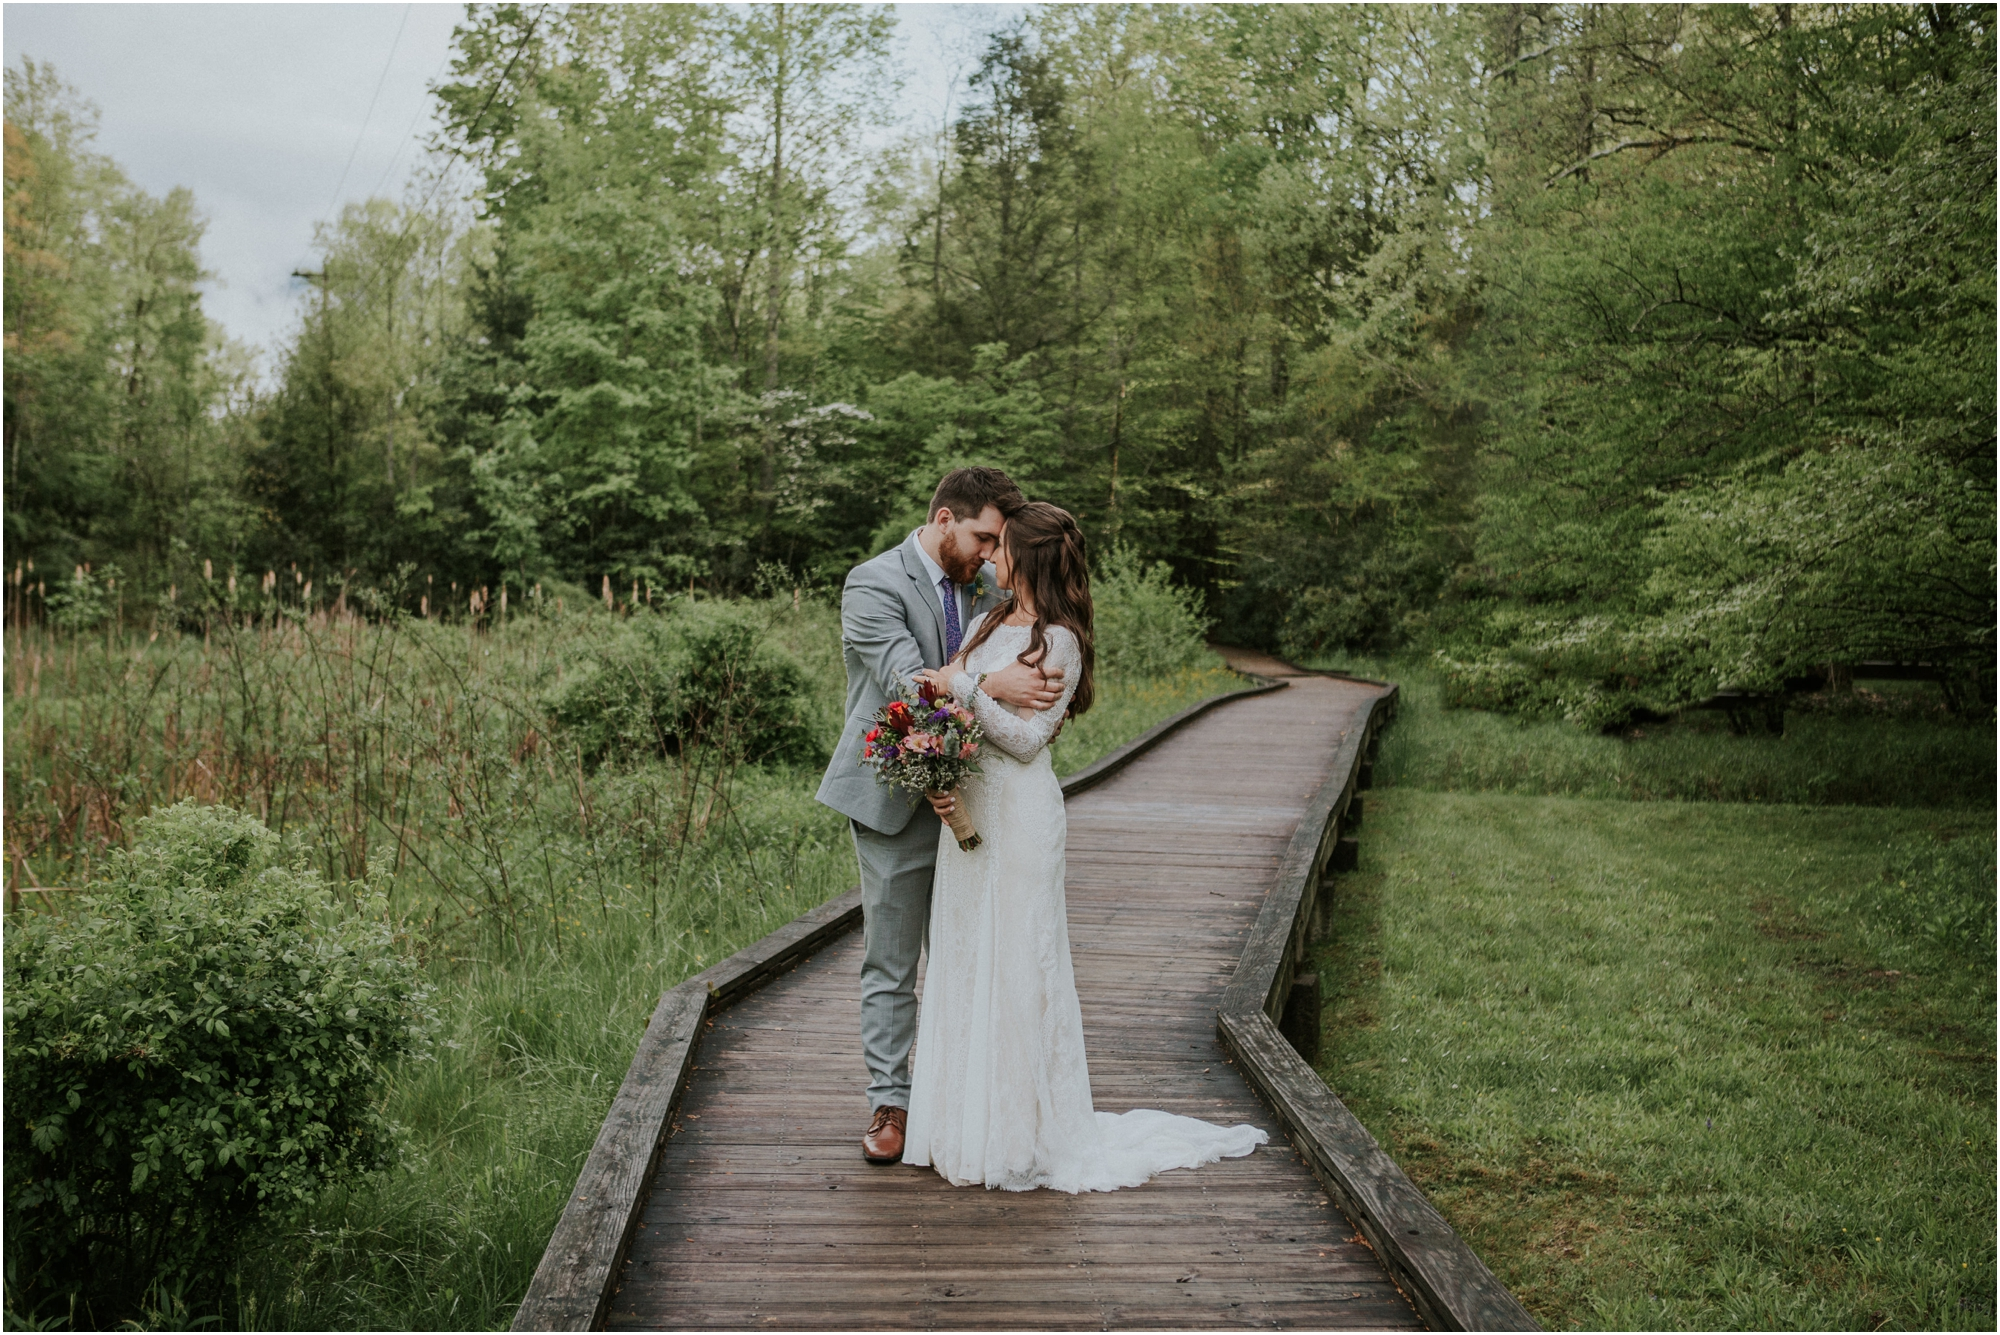 tennessee-state-park-roan-mountain-rustic-bohemian-wedding-katy-sergent-photography-northeast-tn-johnson-city-_0089.jpg